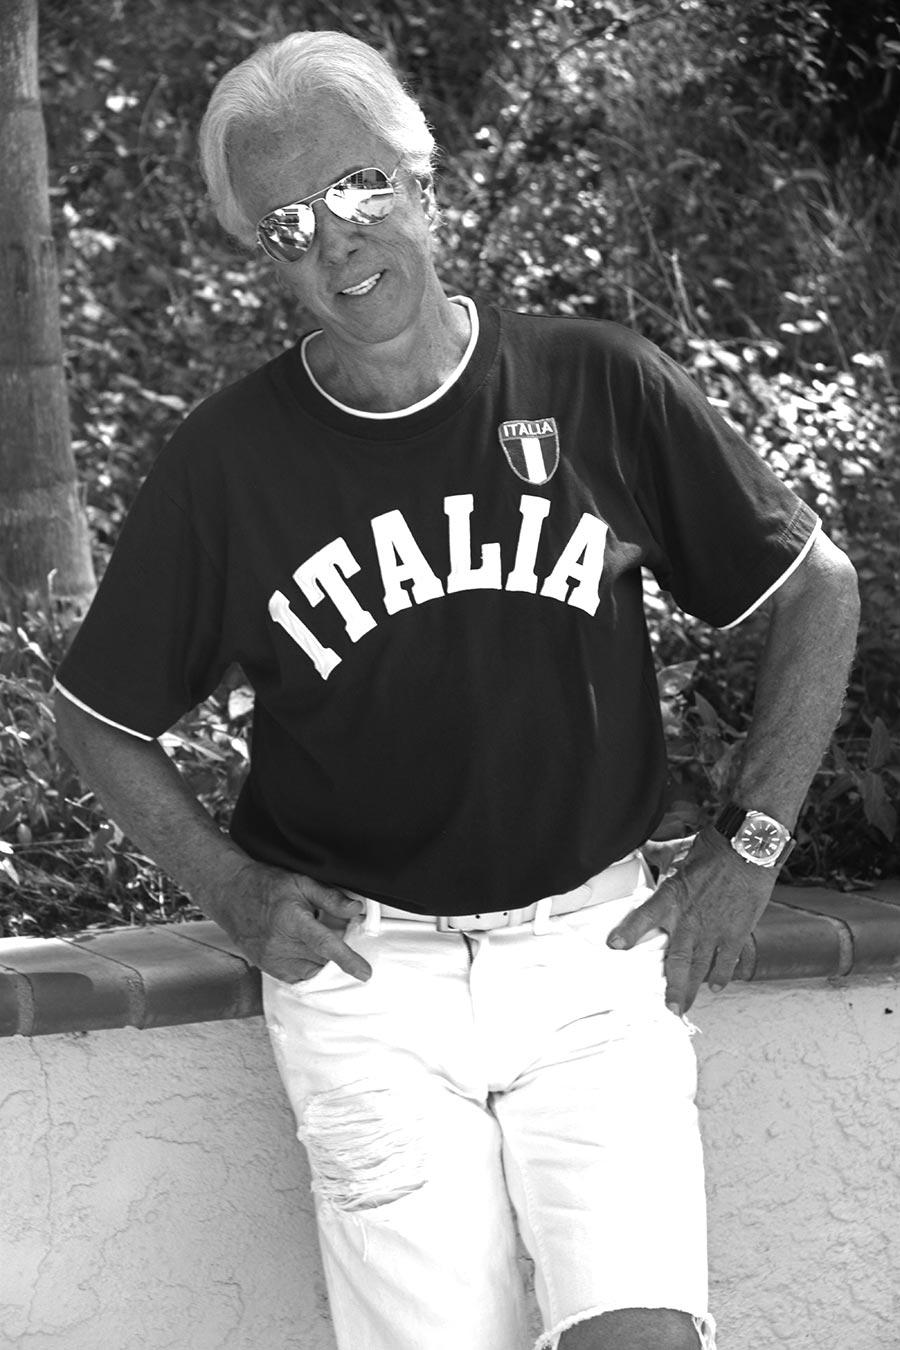 Kris Erik Stevens In Italia Shirt